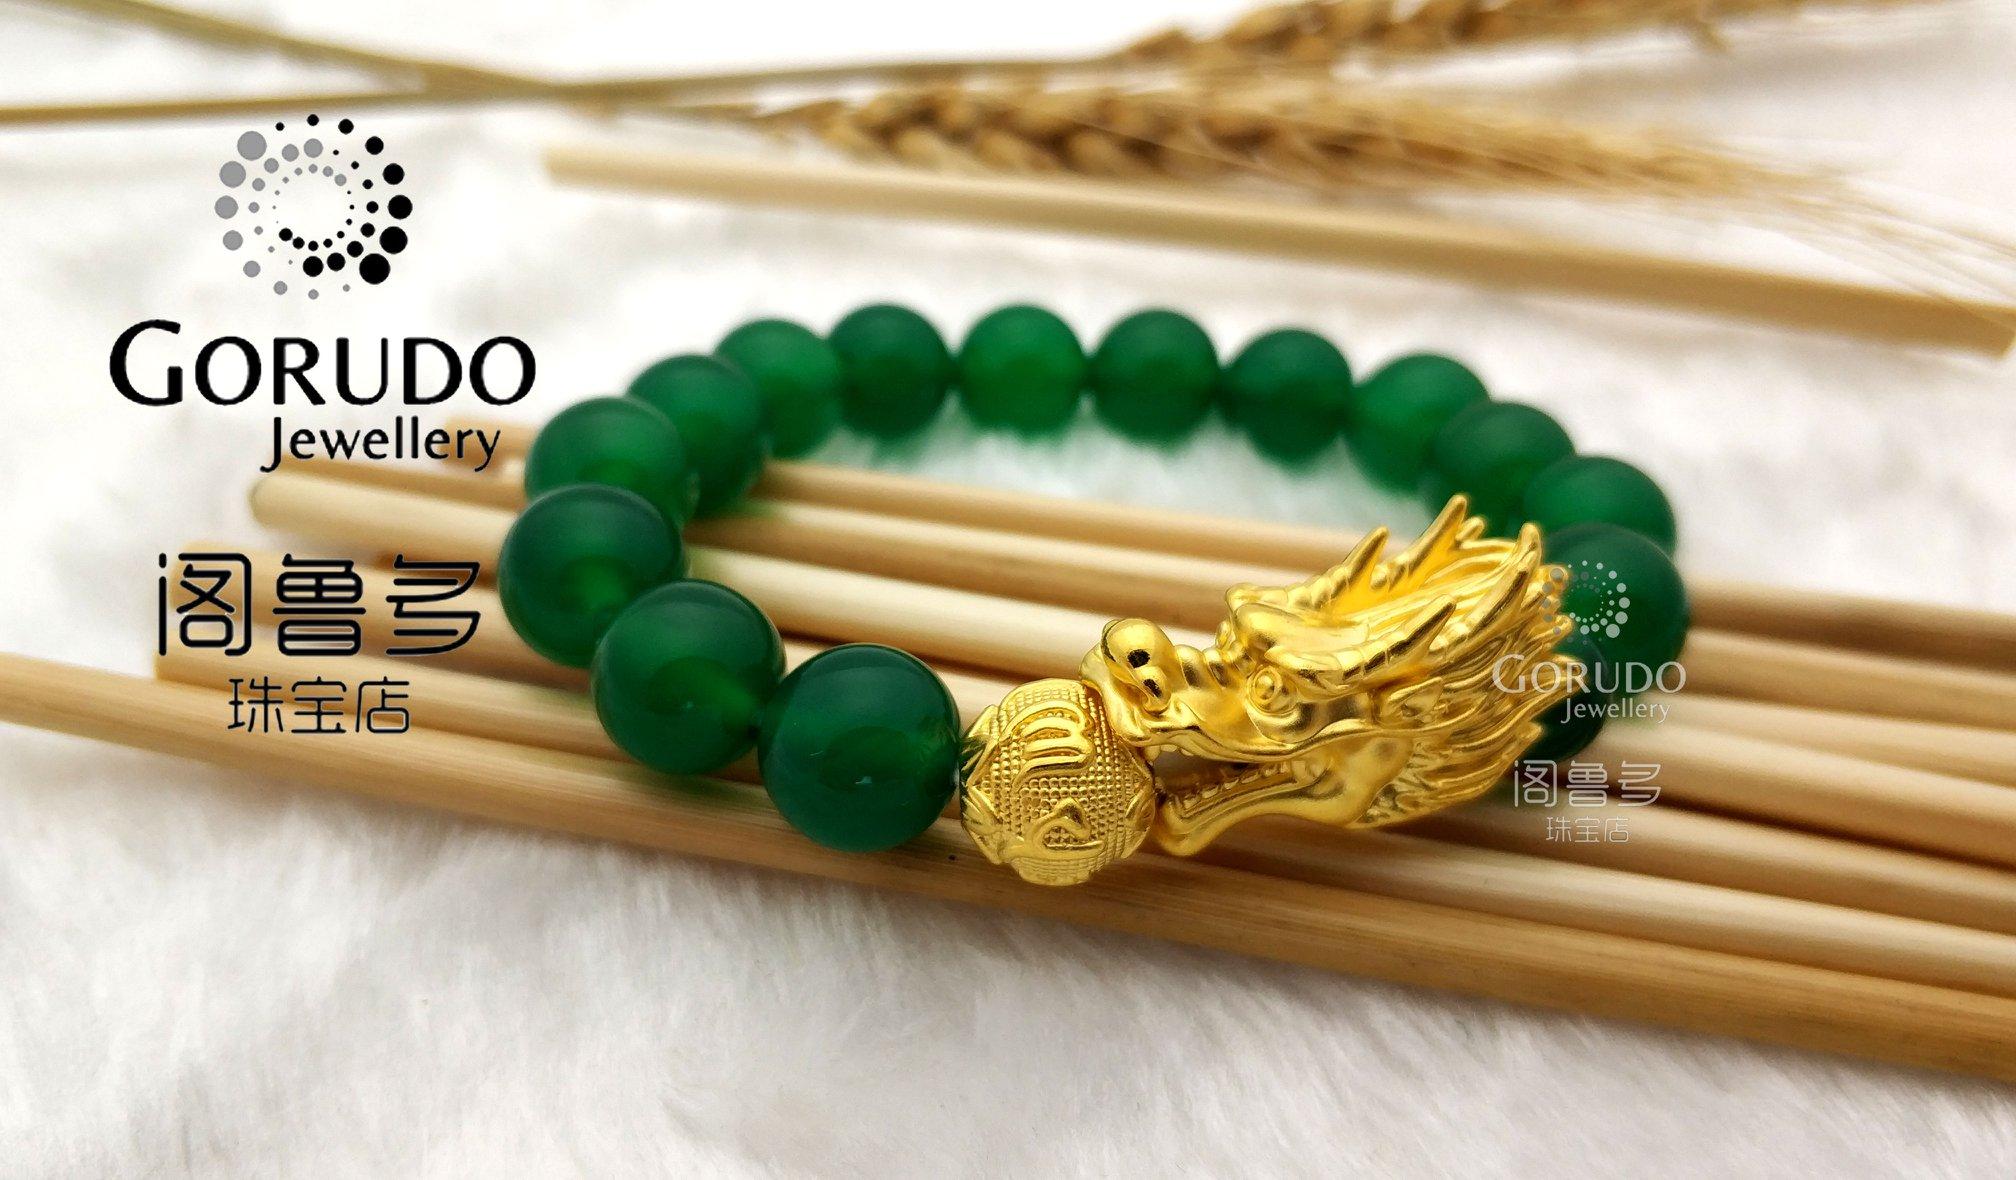 e1fd65775 999 Pure Gold Dragon Head and Gold Ball with Green Agate - Gorudo ...